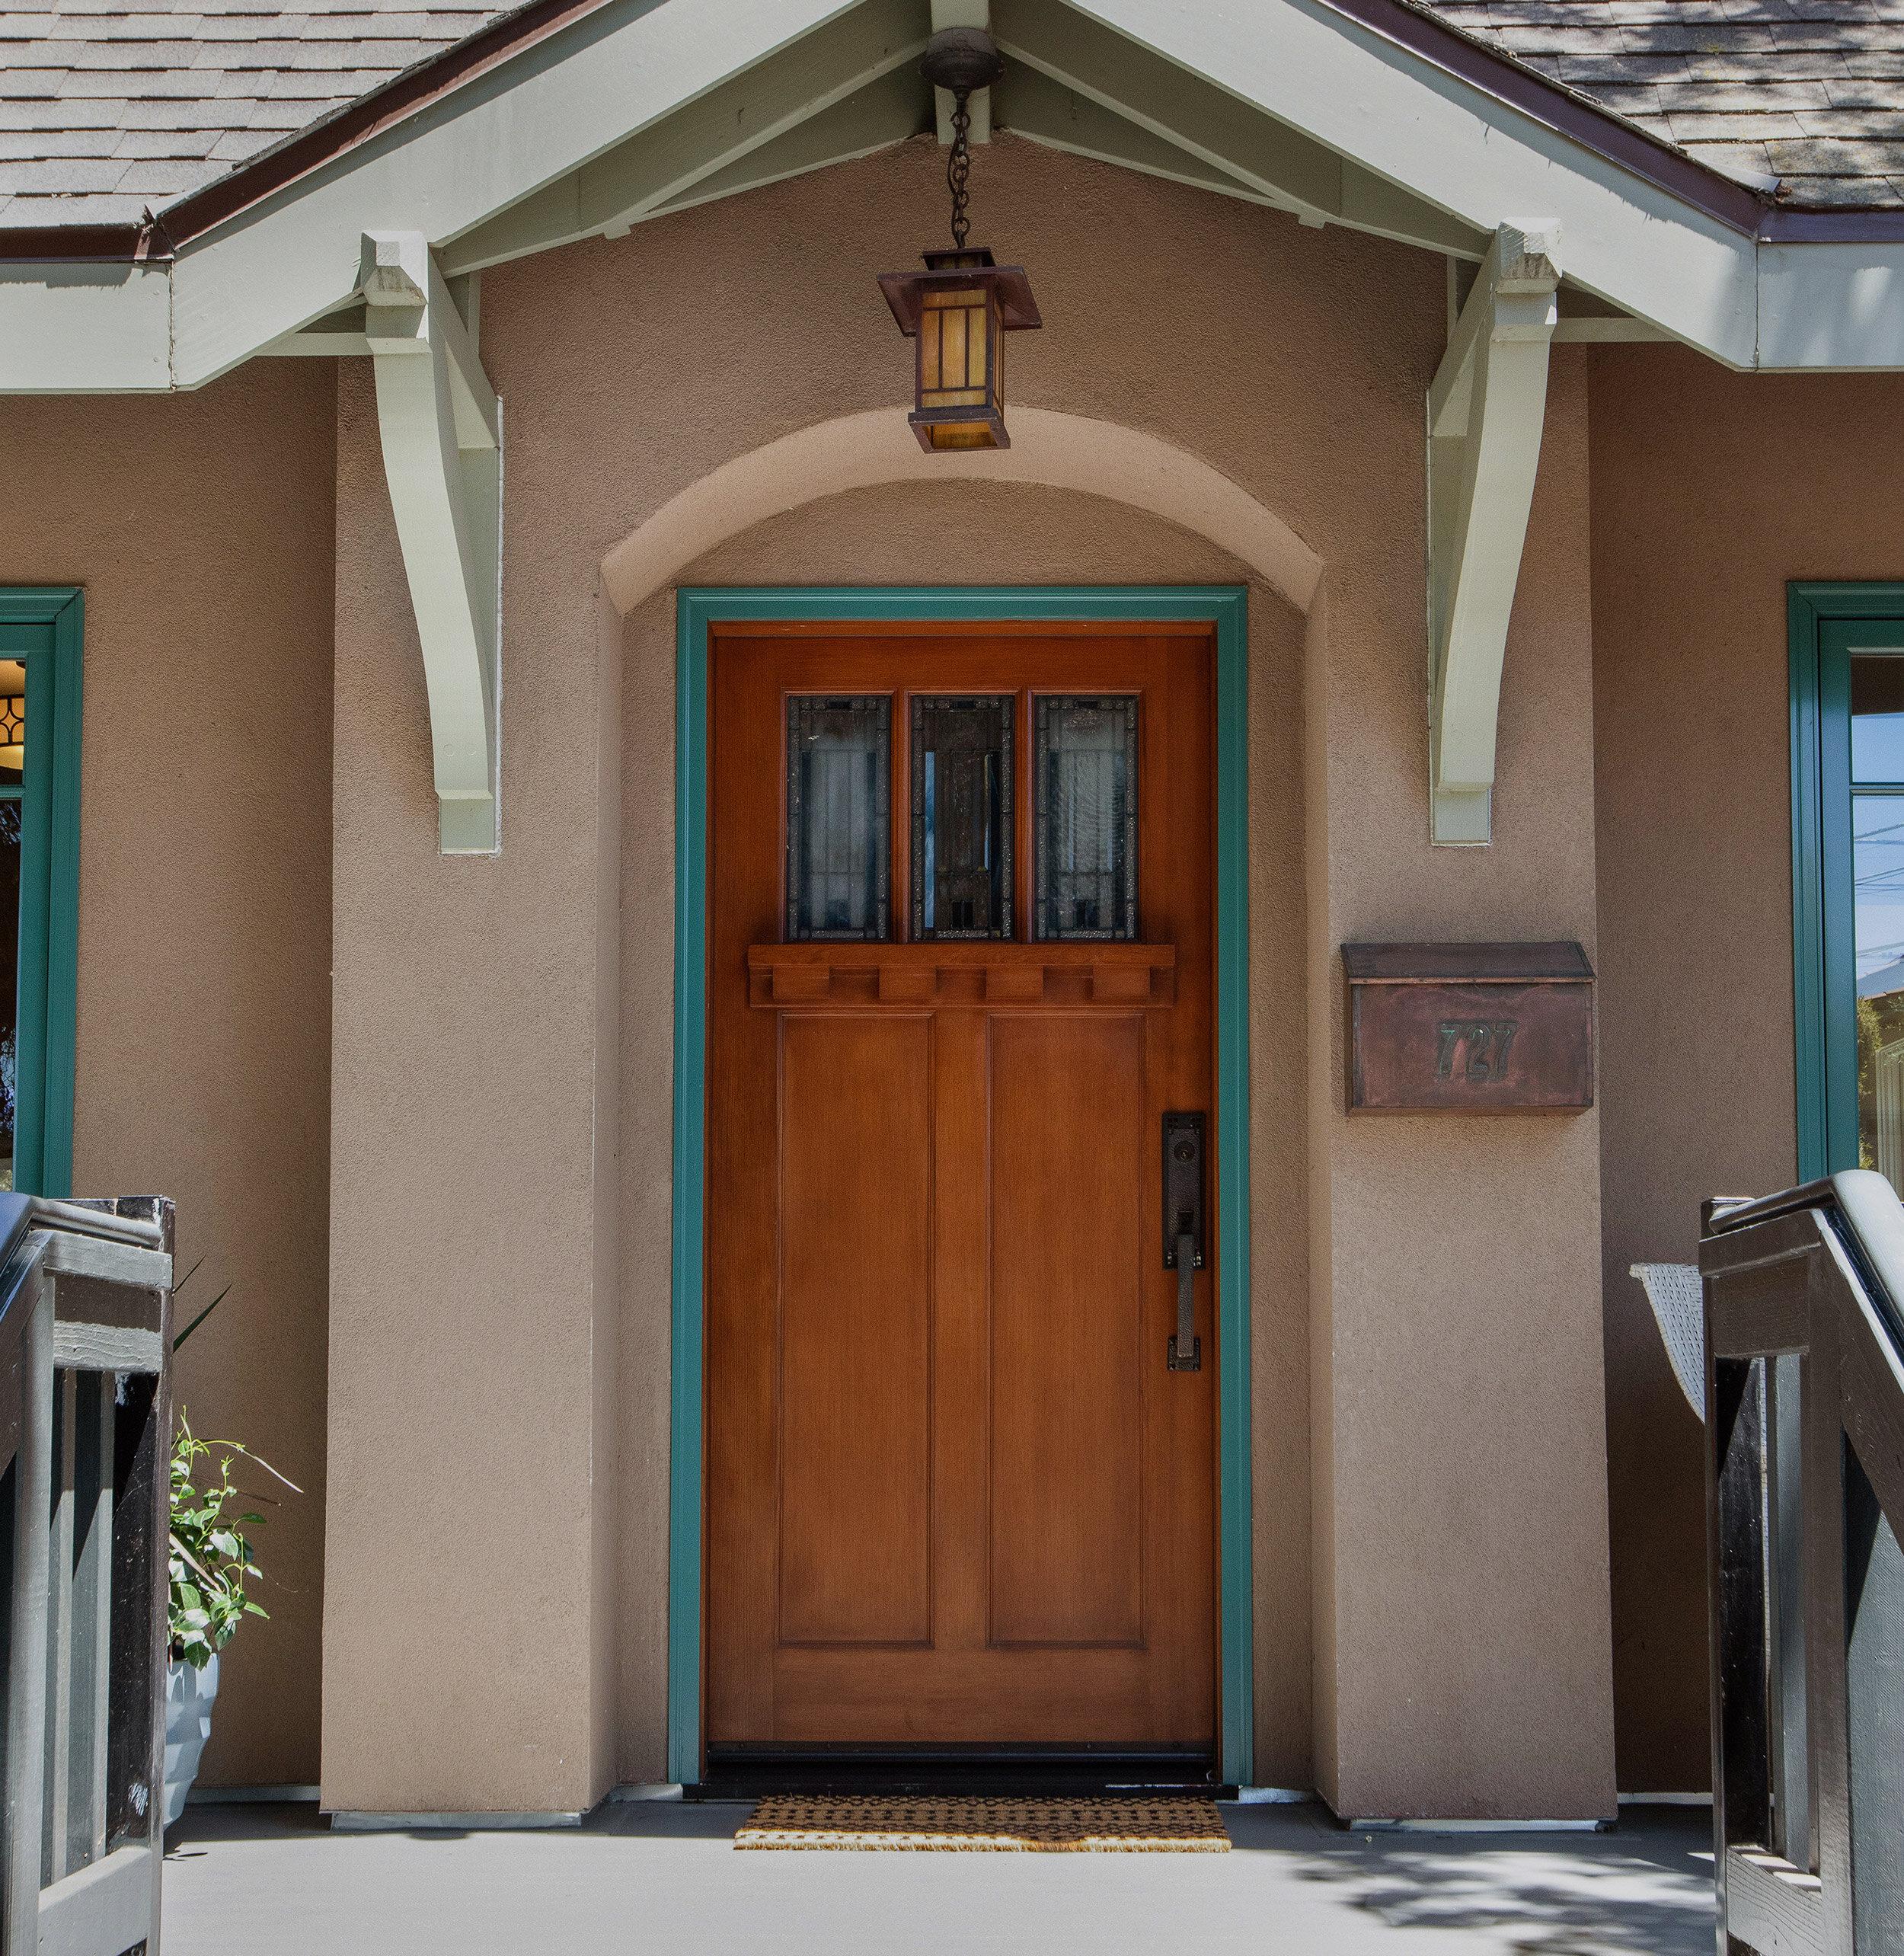 Project Management Services: - Interior + Exterior PaintingBath + Kitchen UpdatesHardware + Lighting UpgradeHouse DetailingNew Wood + Tile Floor InstallationNew Appliance InstallationLandscapingStaging + Fine Art Rental